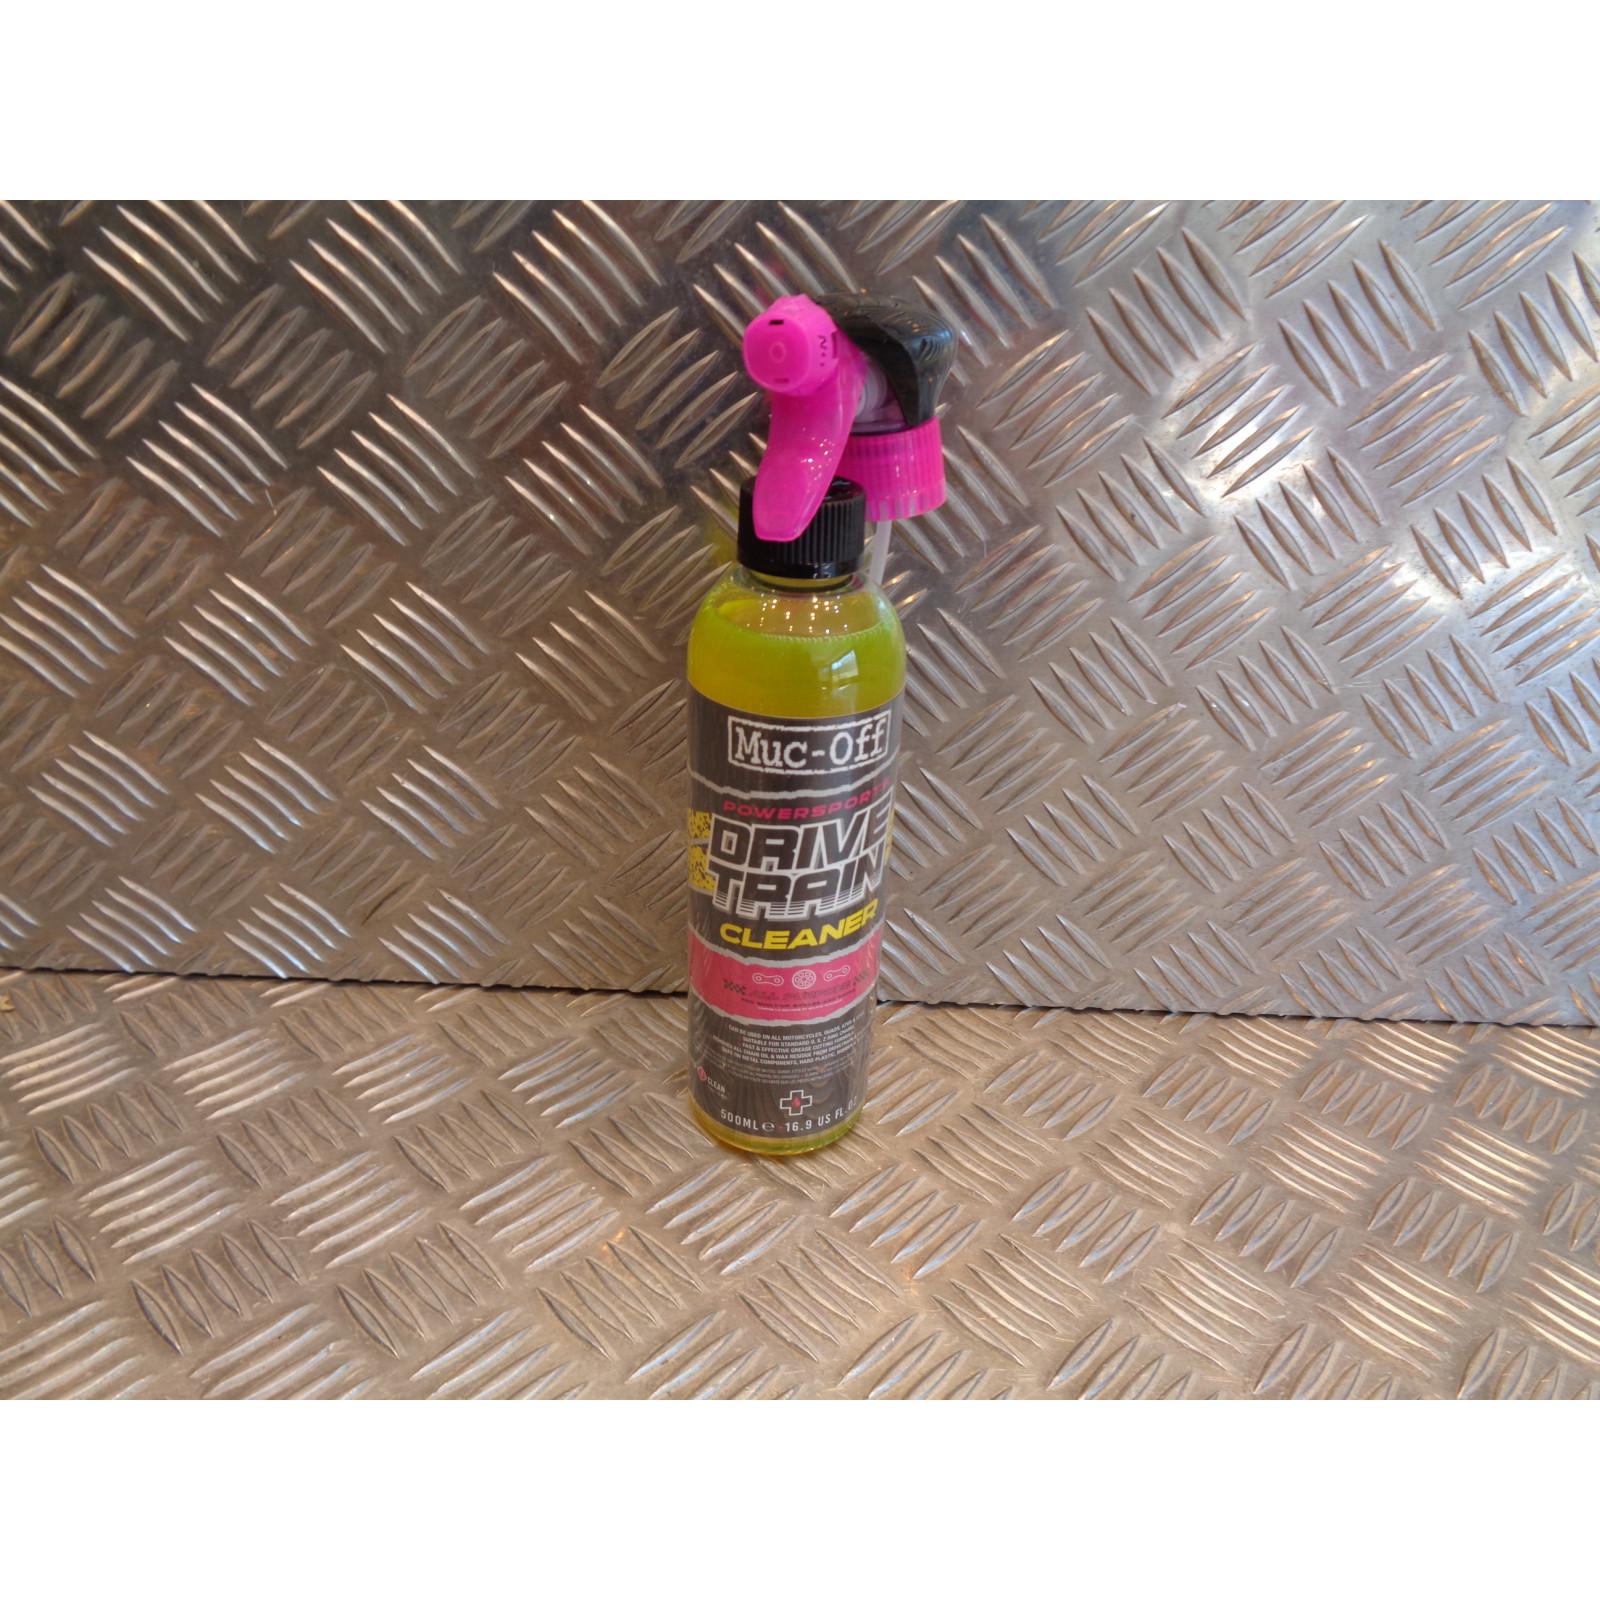 spray cleaner drivetrain MUC-OFF 500ml nettoyant chaine biodegradable moto velo vtt quad ssv buggy